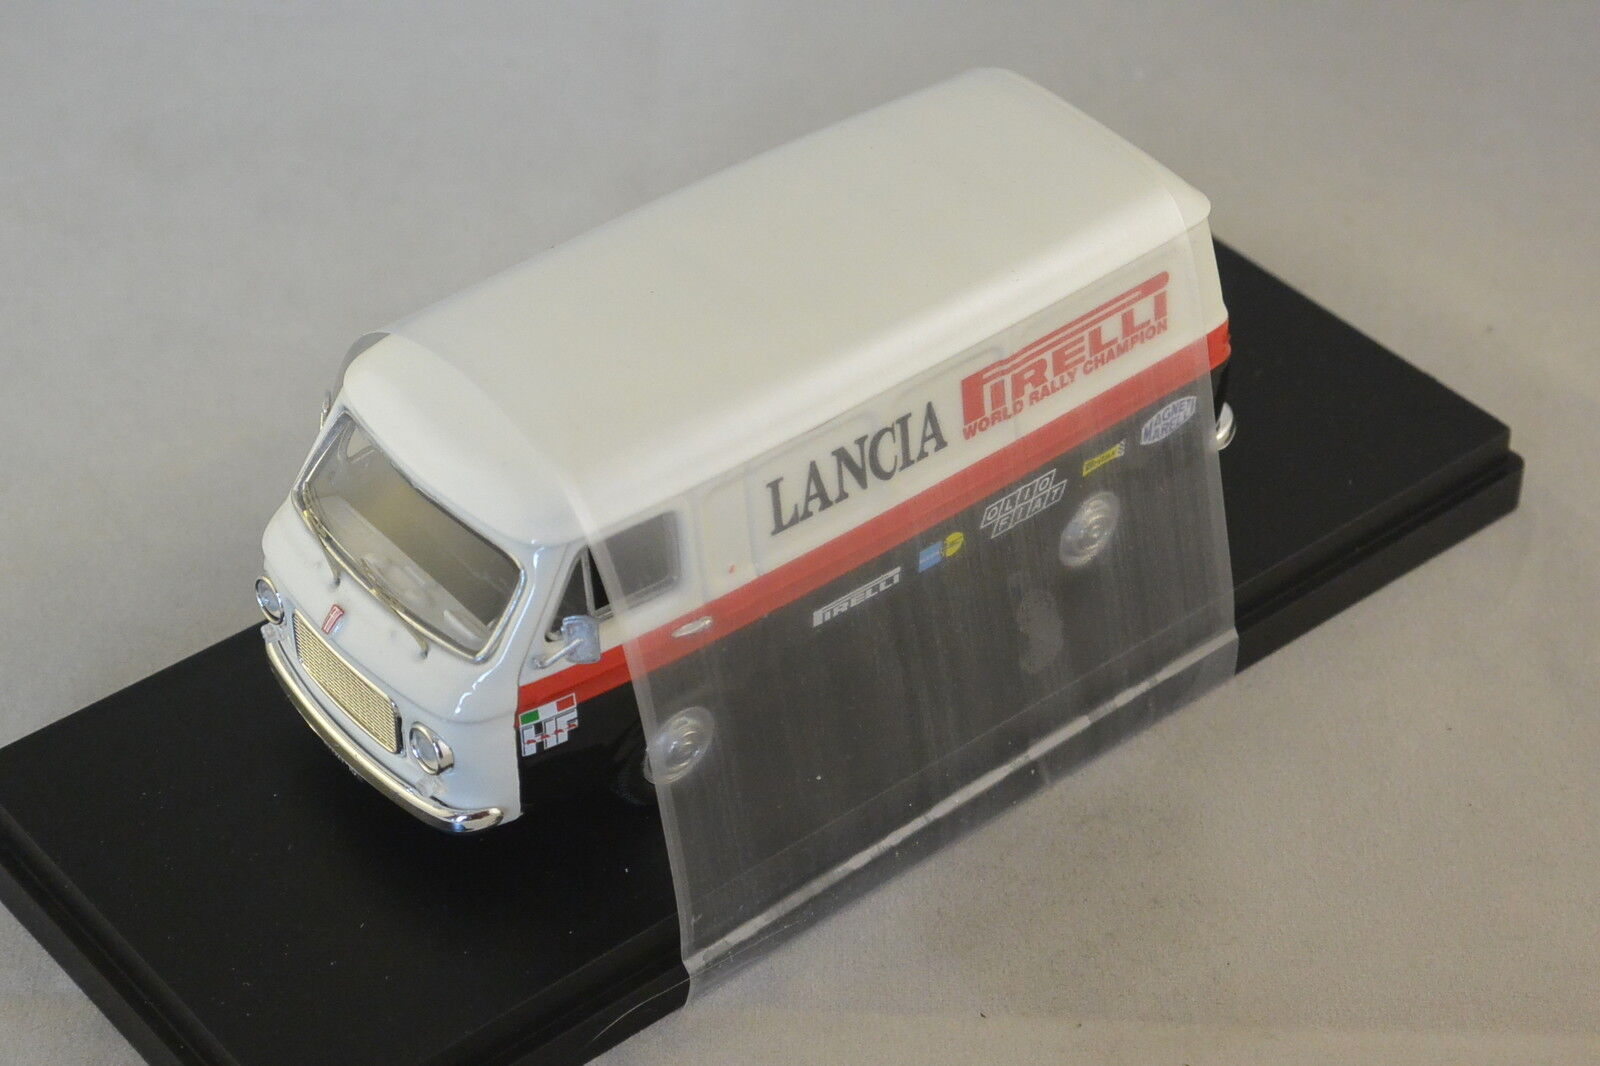 Rio 4407 - Fiat 238 Assistance Lancia - 1970    1 43